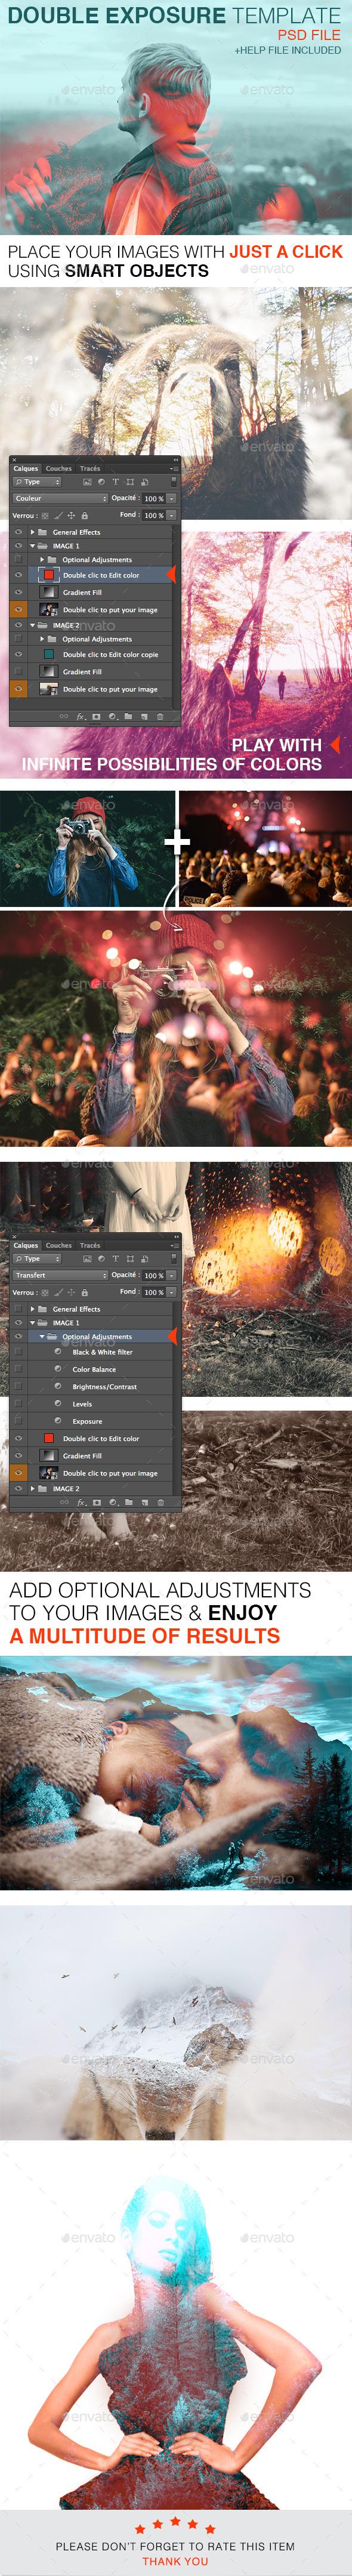 Douple Exposure Template - Photo Templates Graphics